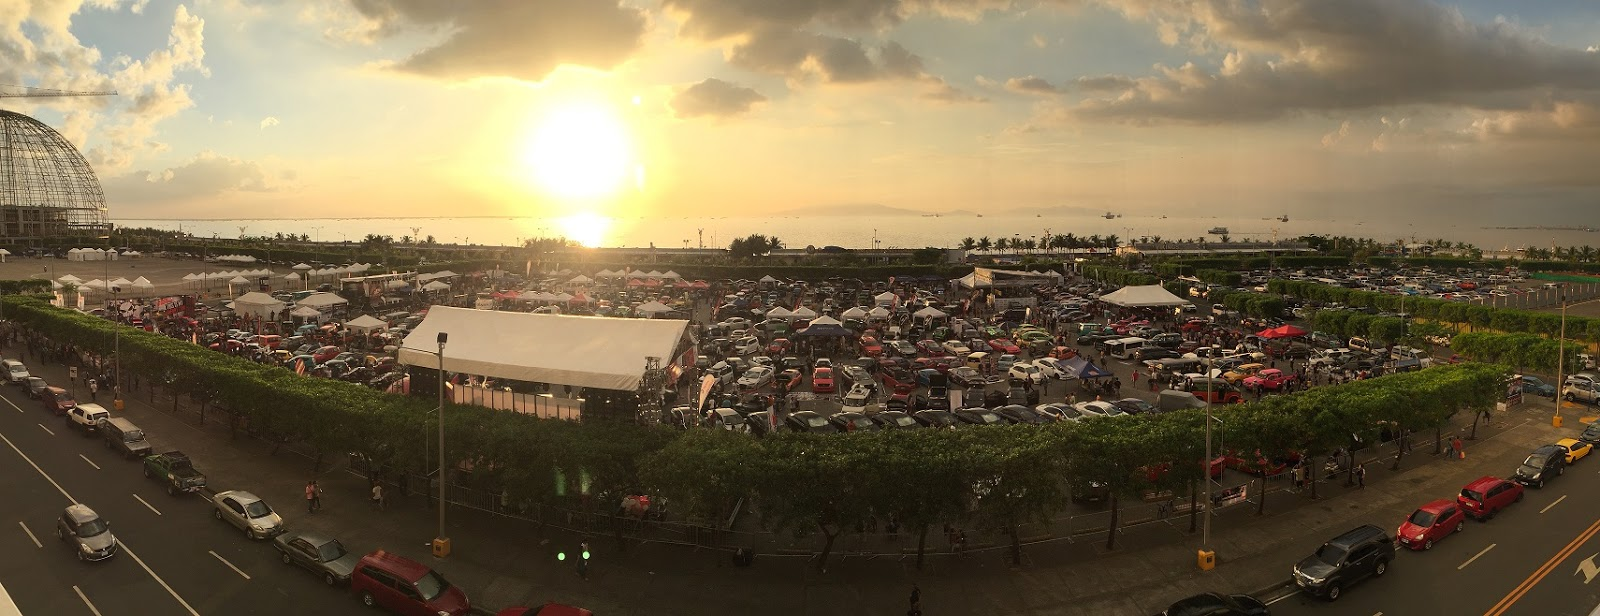 Bumper to Bumper XI holds successful car show event at SM MOA ...